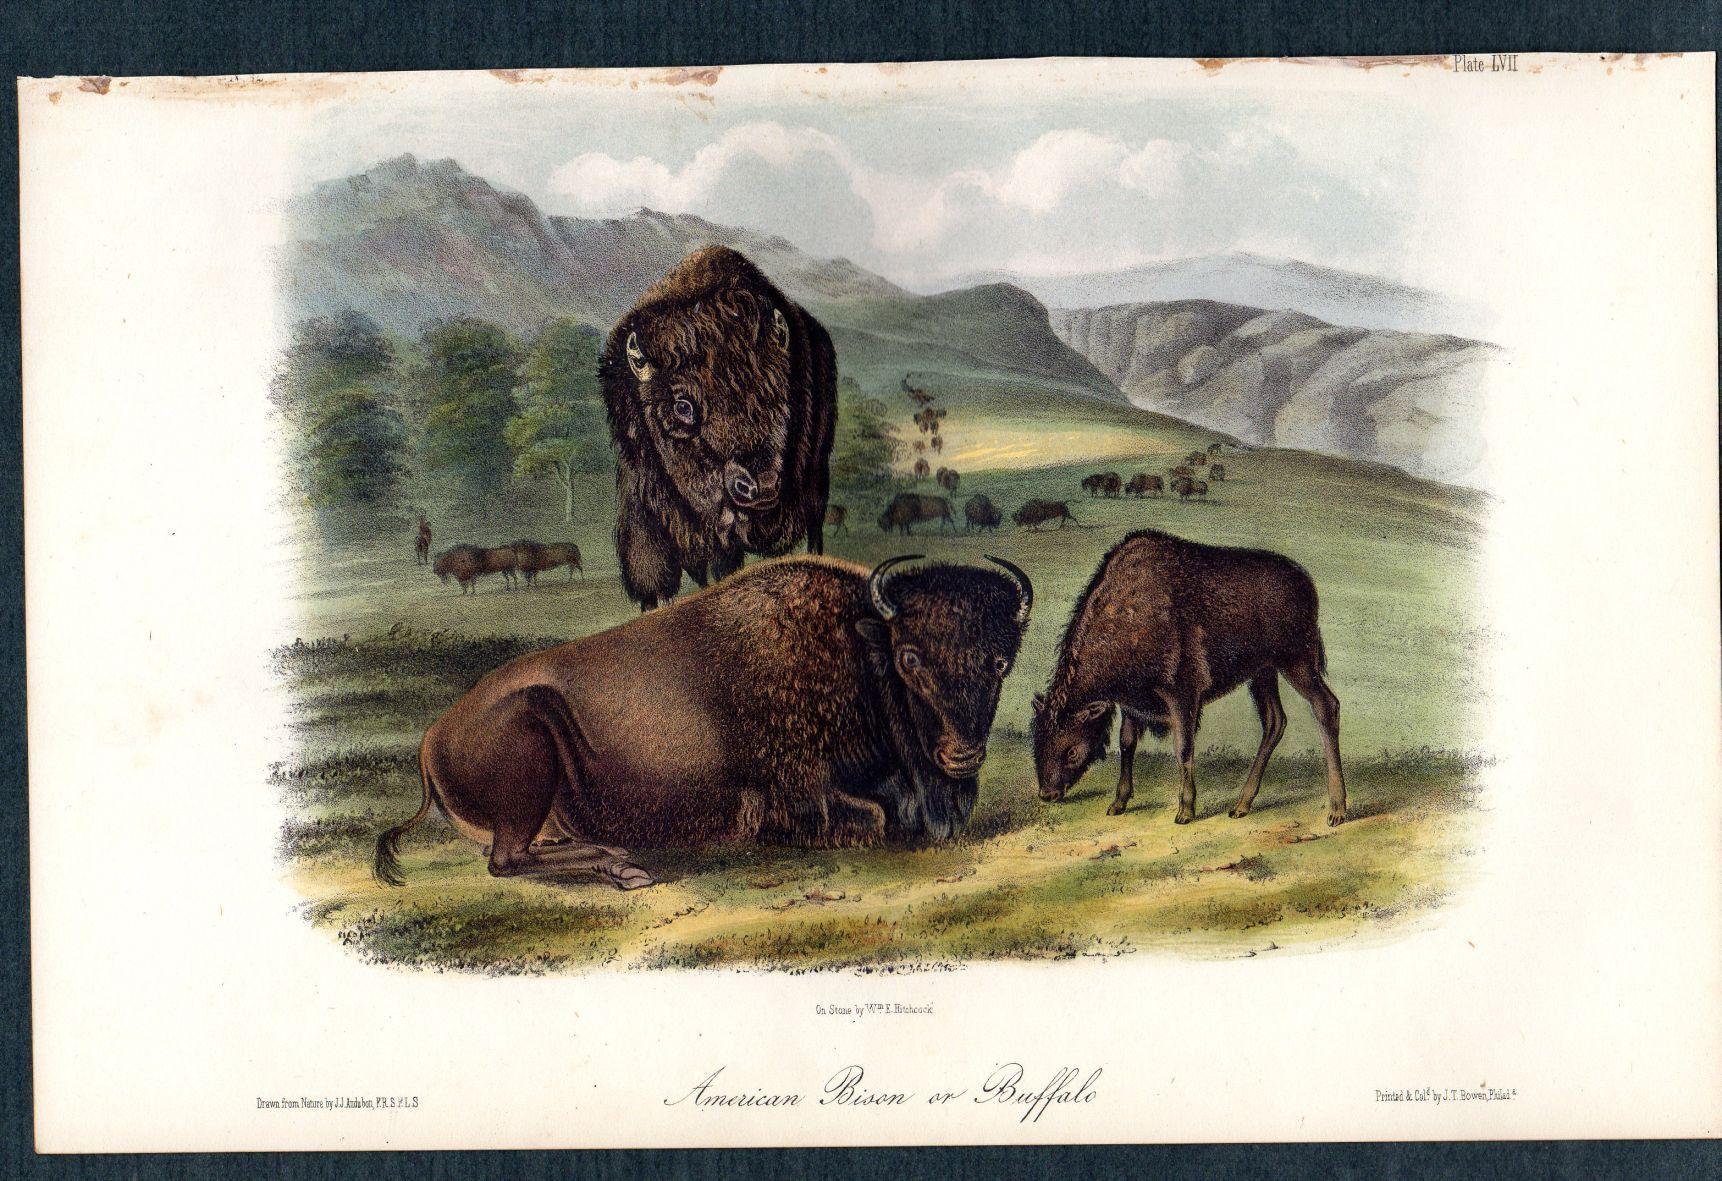 Audubon AMERICAN BISON or BUFFALO Quadrupeds of North America Plate 57 1st Ed 1851